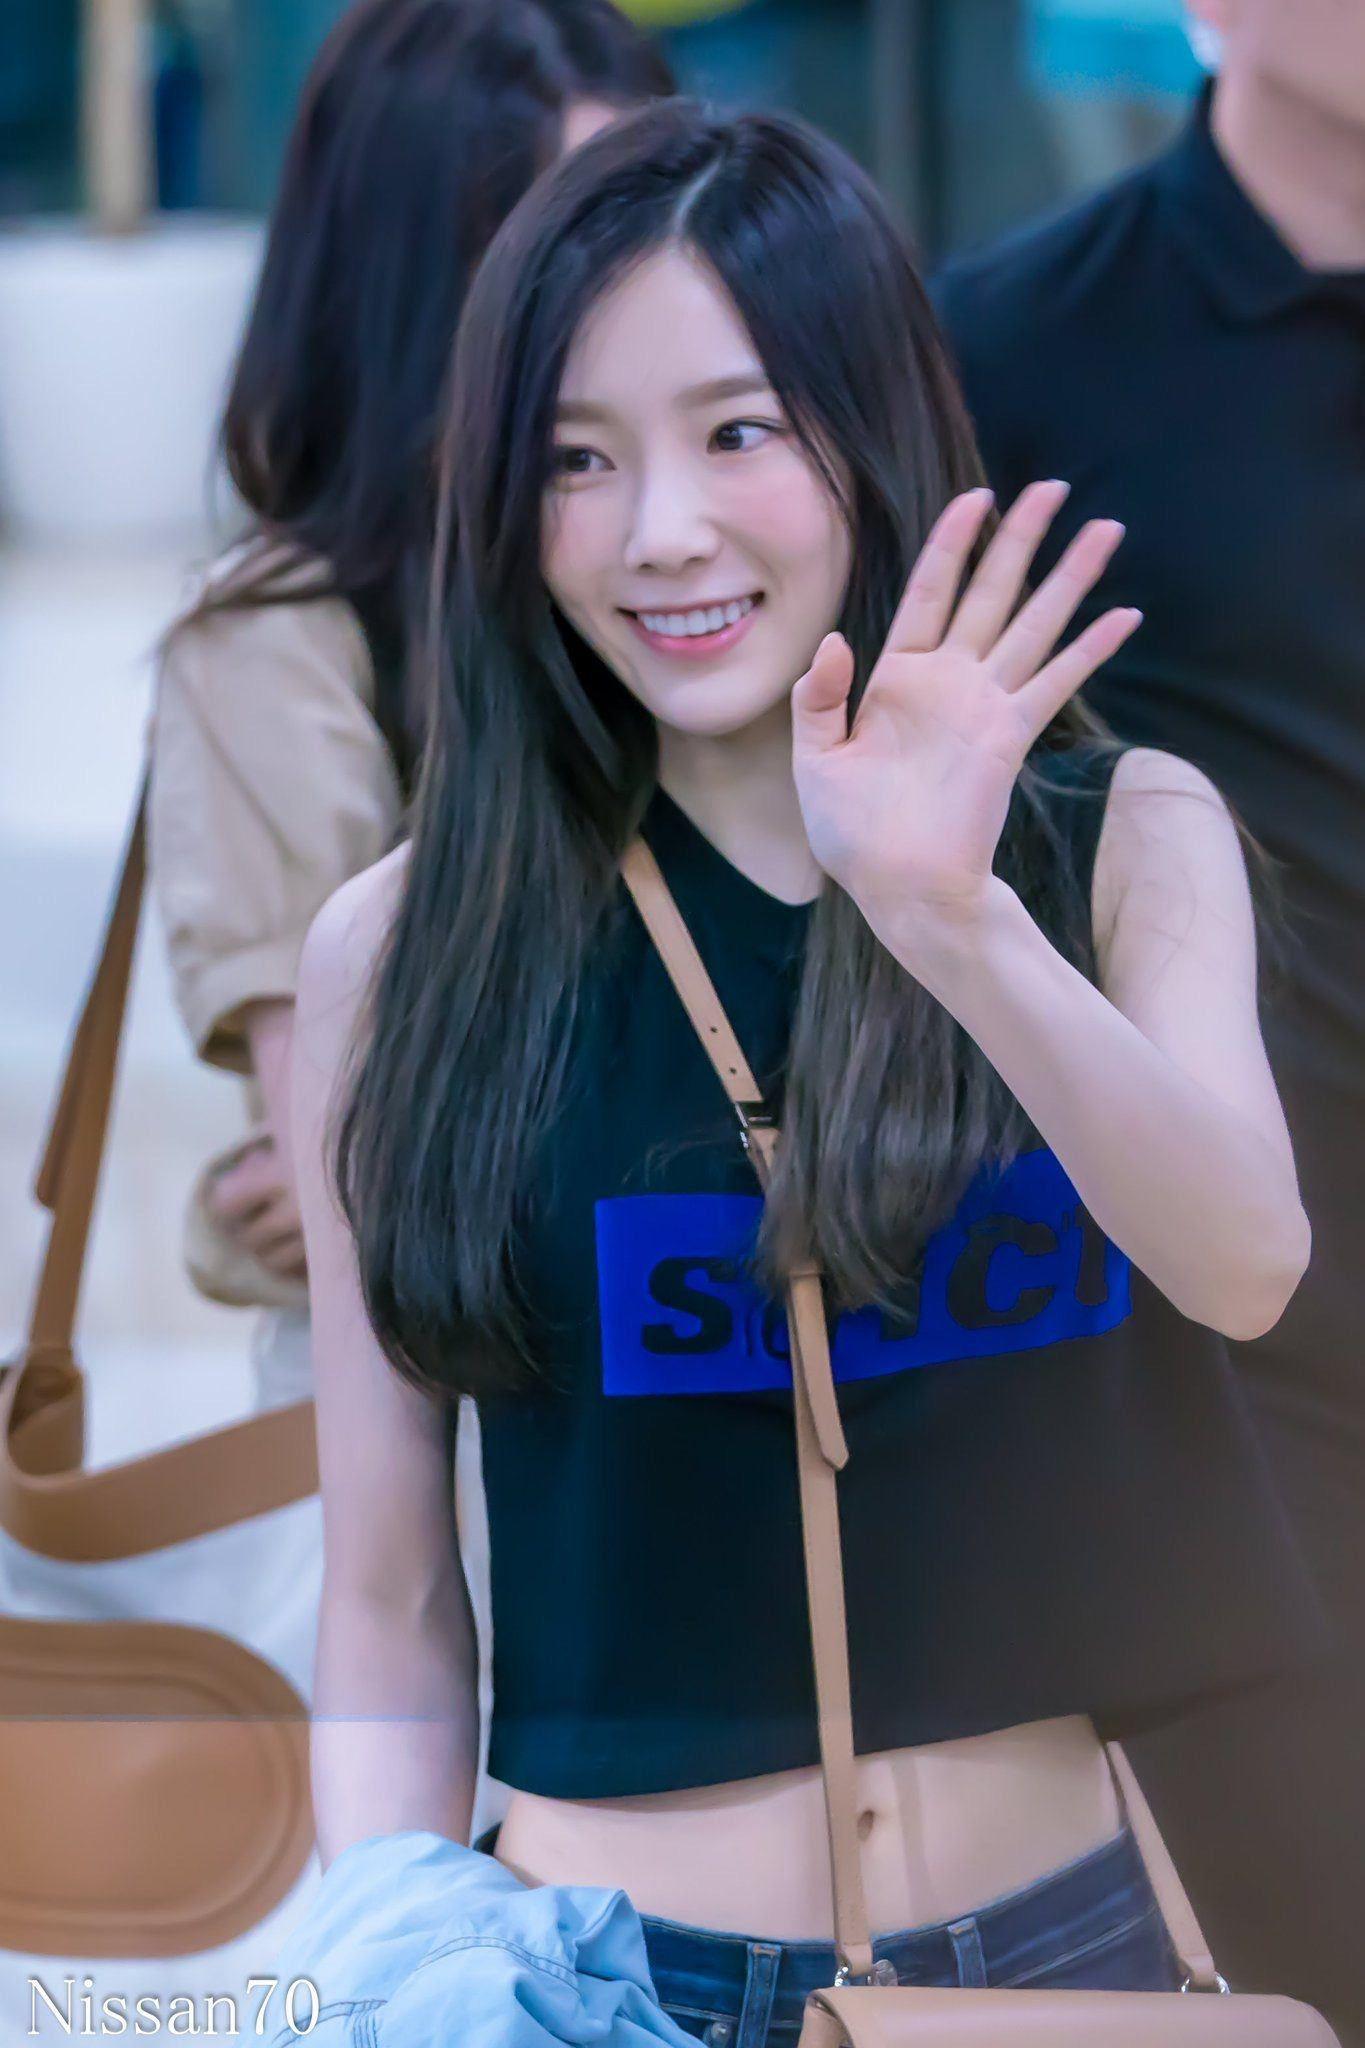 Taeyeon Wore A Crop Top And Exposed Her Perfect Midriff Koreaboo Girls Generation Taeyeon Taeyeon Kpop Girls